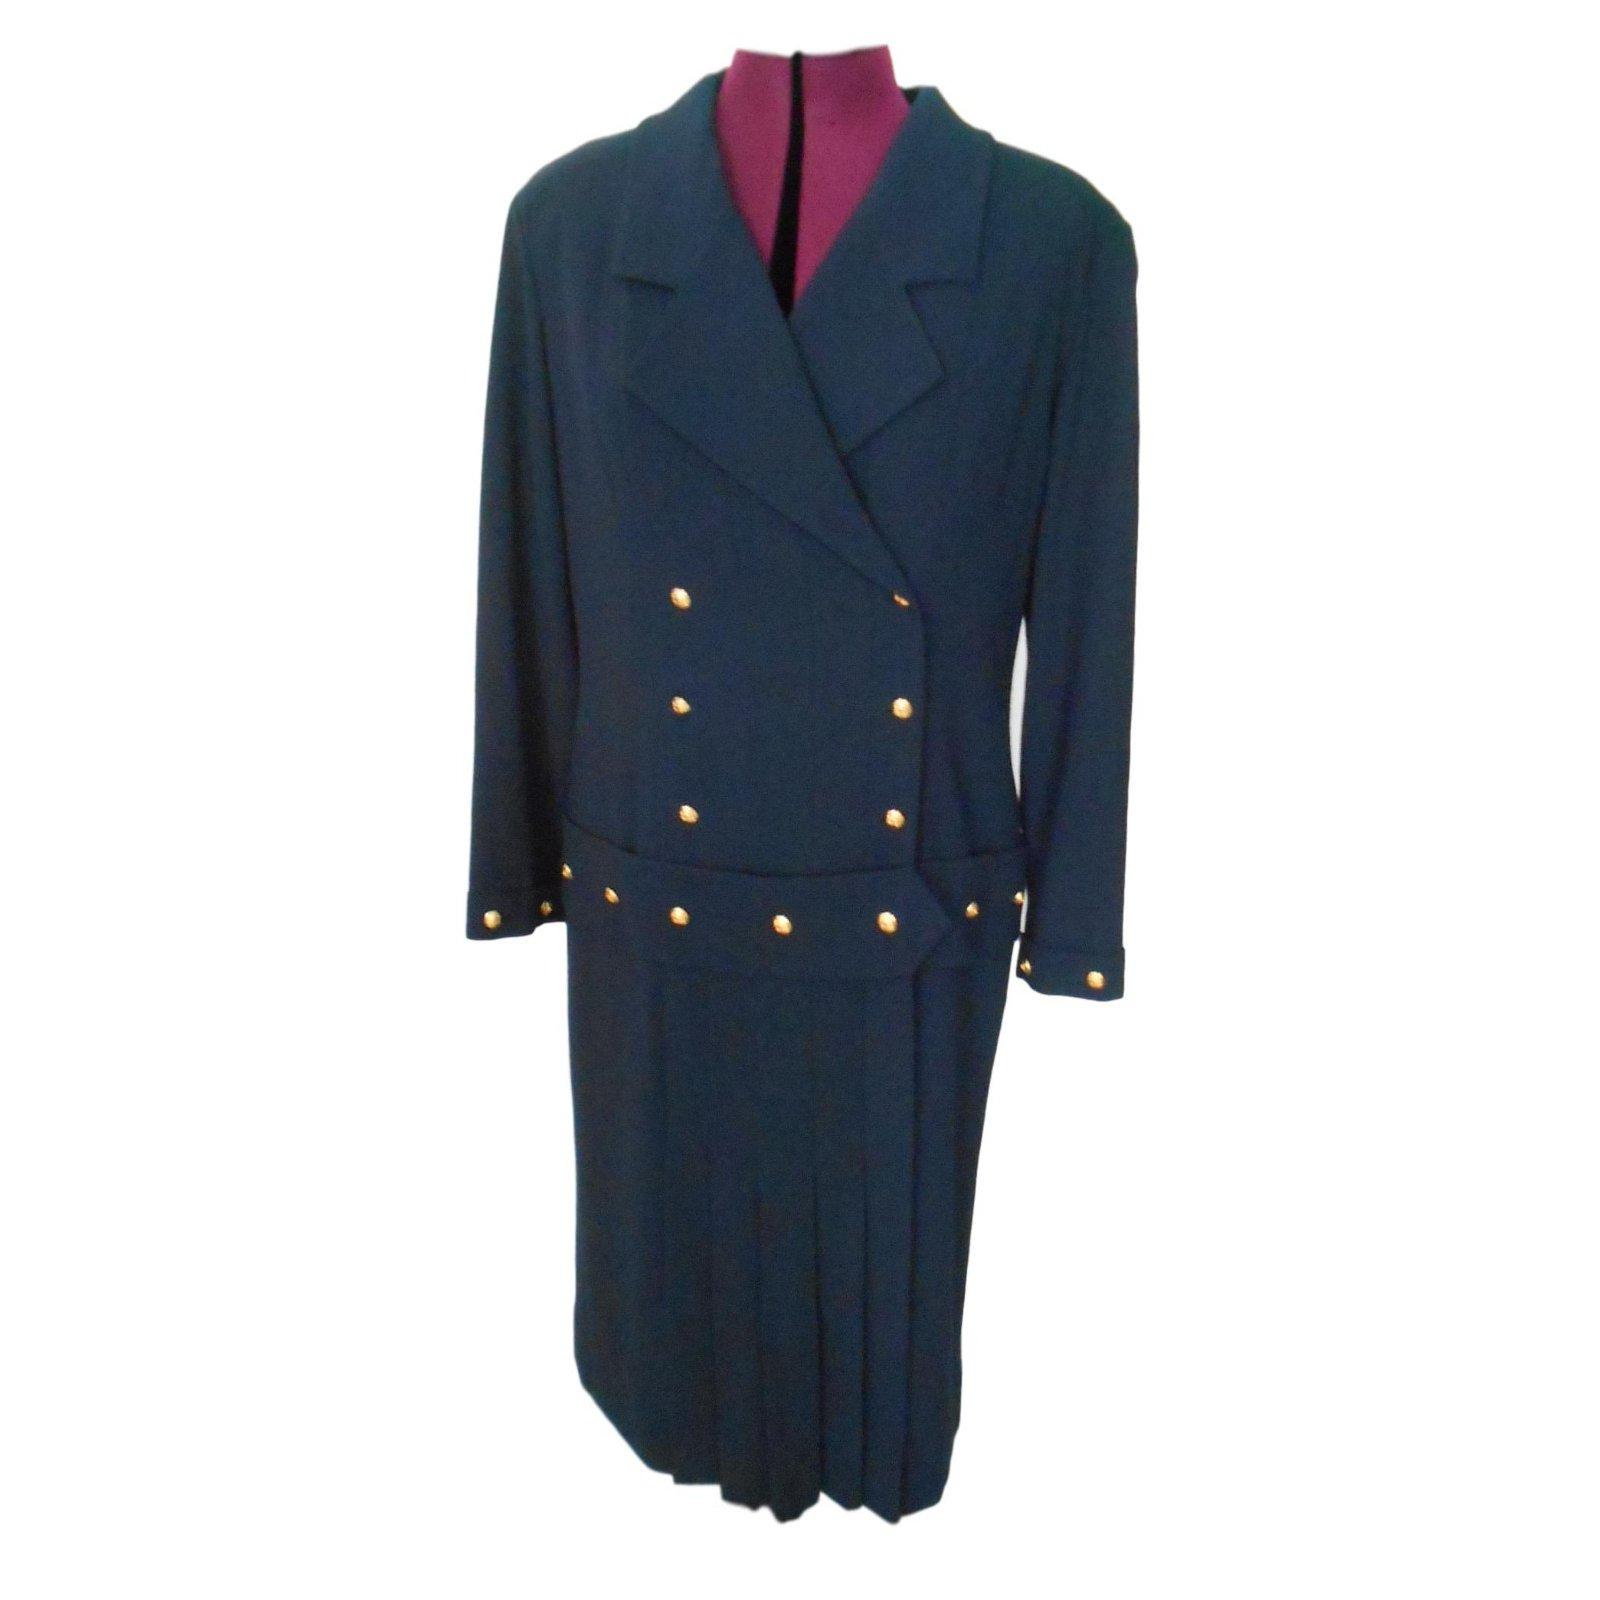 robes chanel robe style ann e 20 laine et soie laine bleu. Black Bedroom Furniture Sets. Home Design Ideas